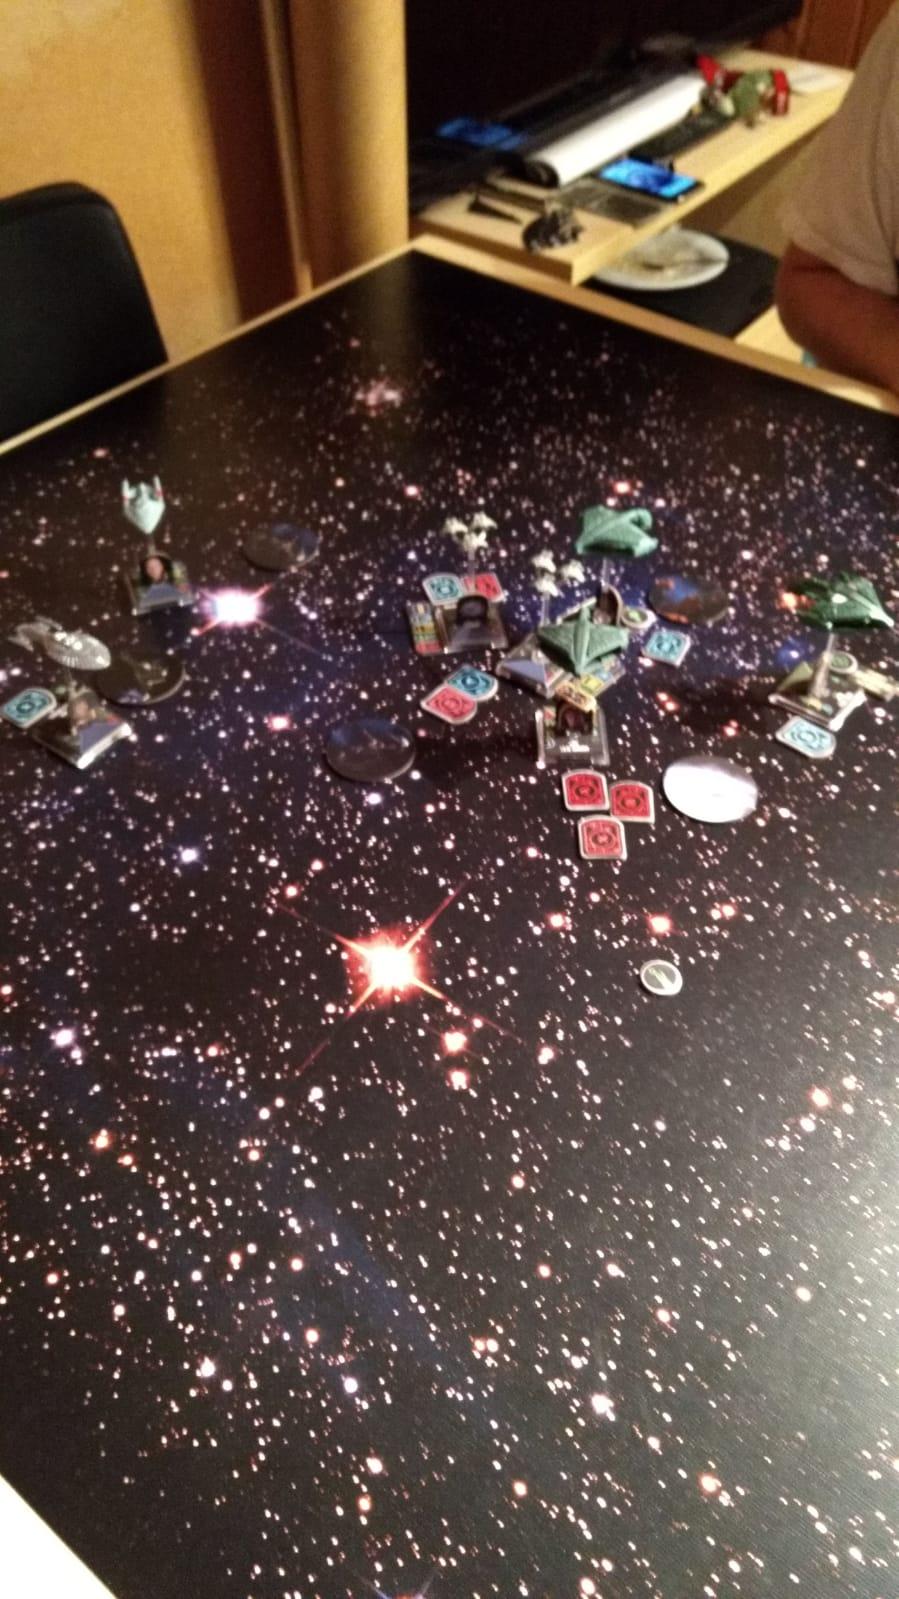 Kampf um Jouret [Föd. vs. Romulaner] Spiel510